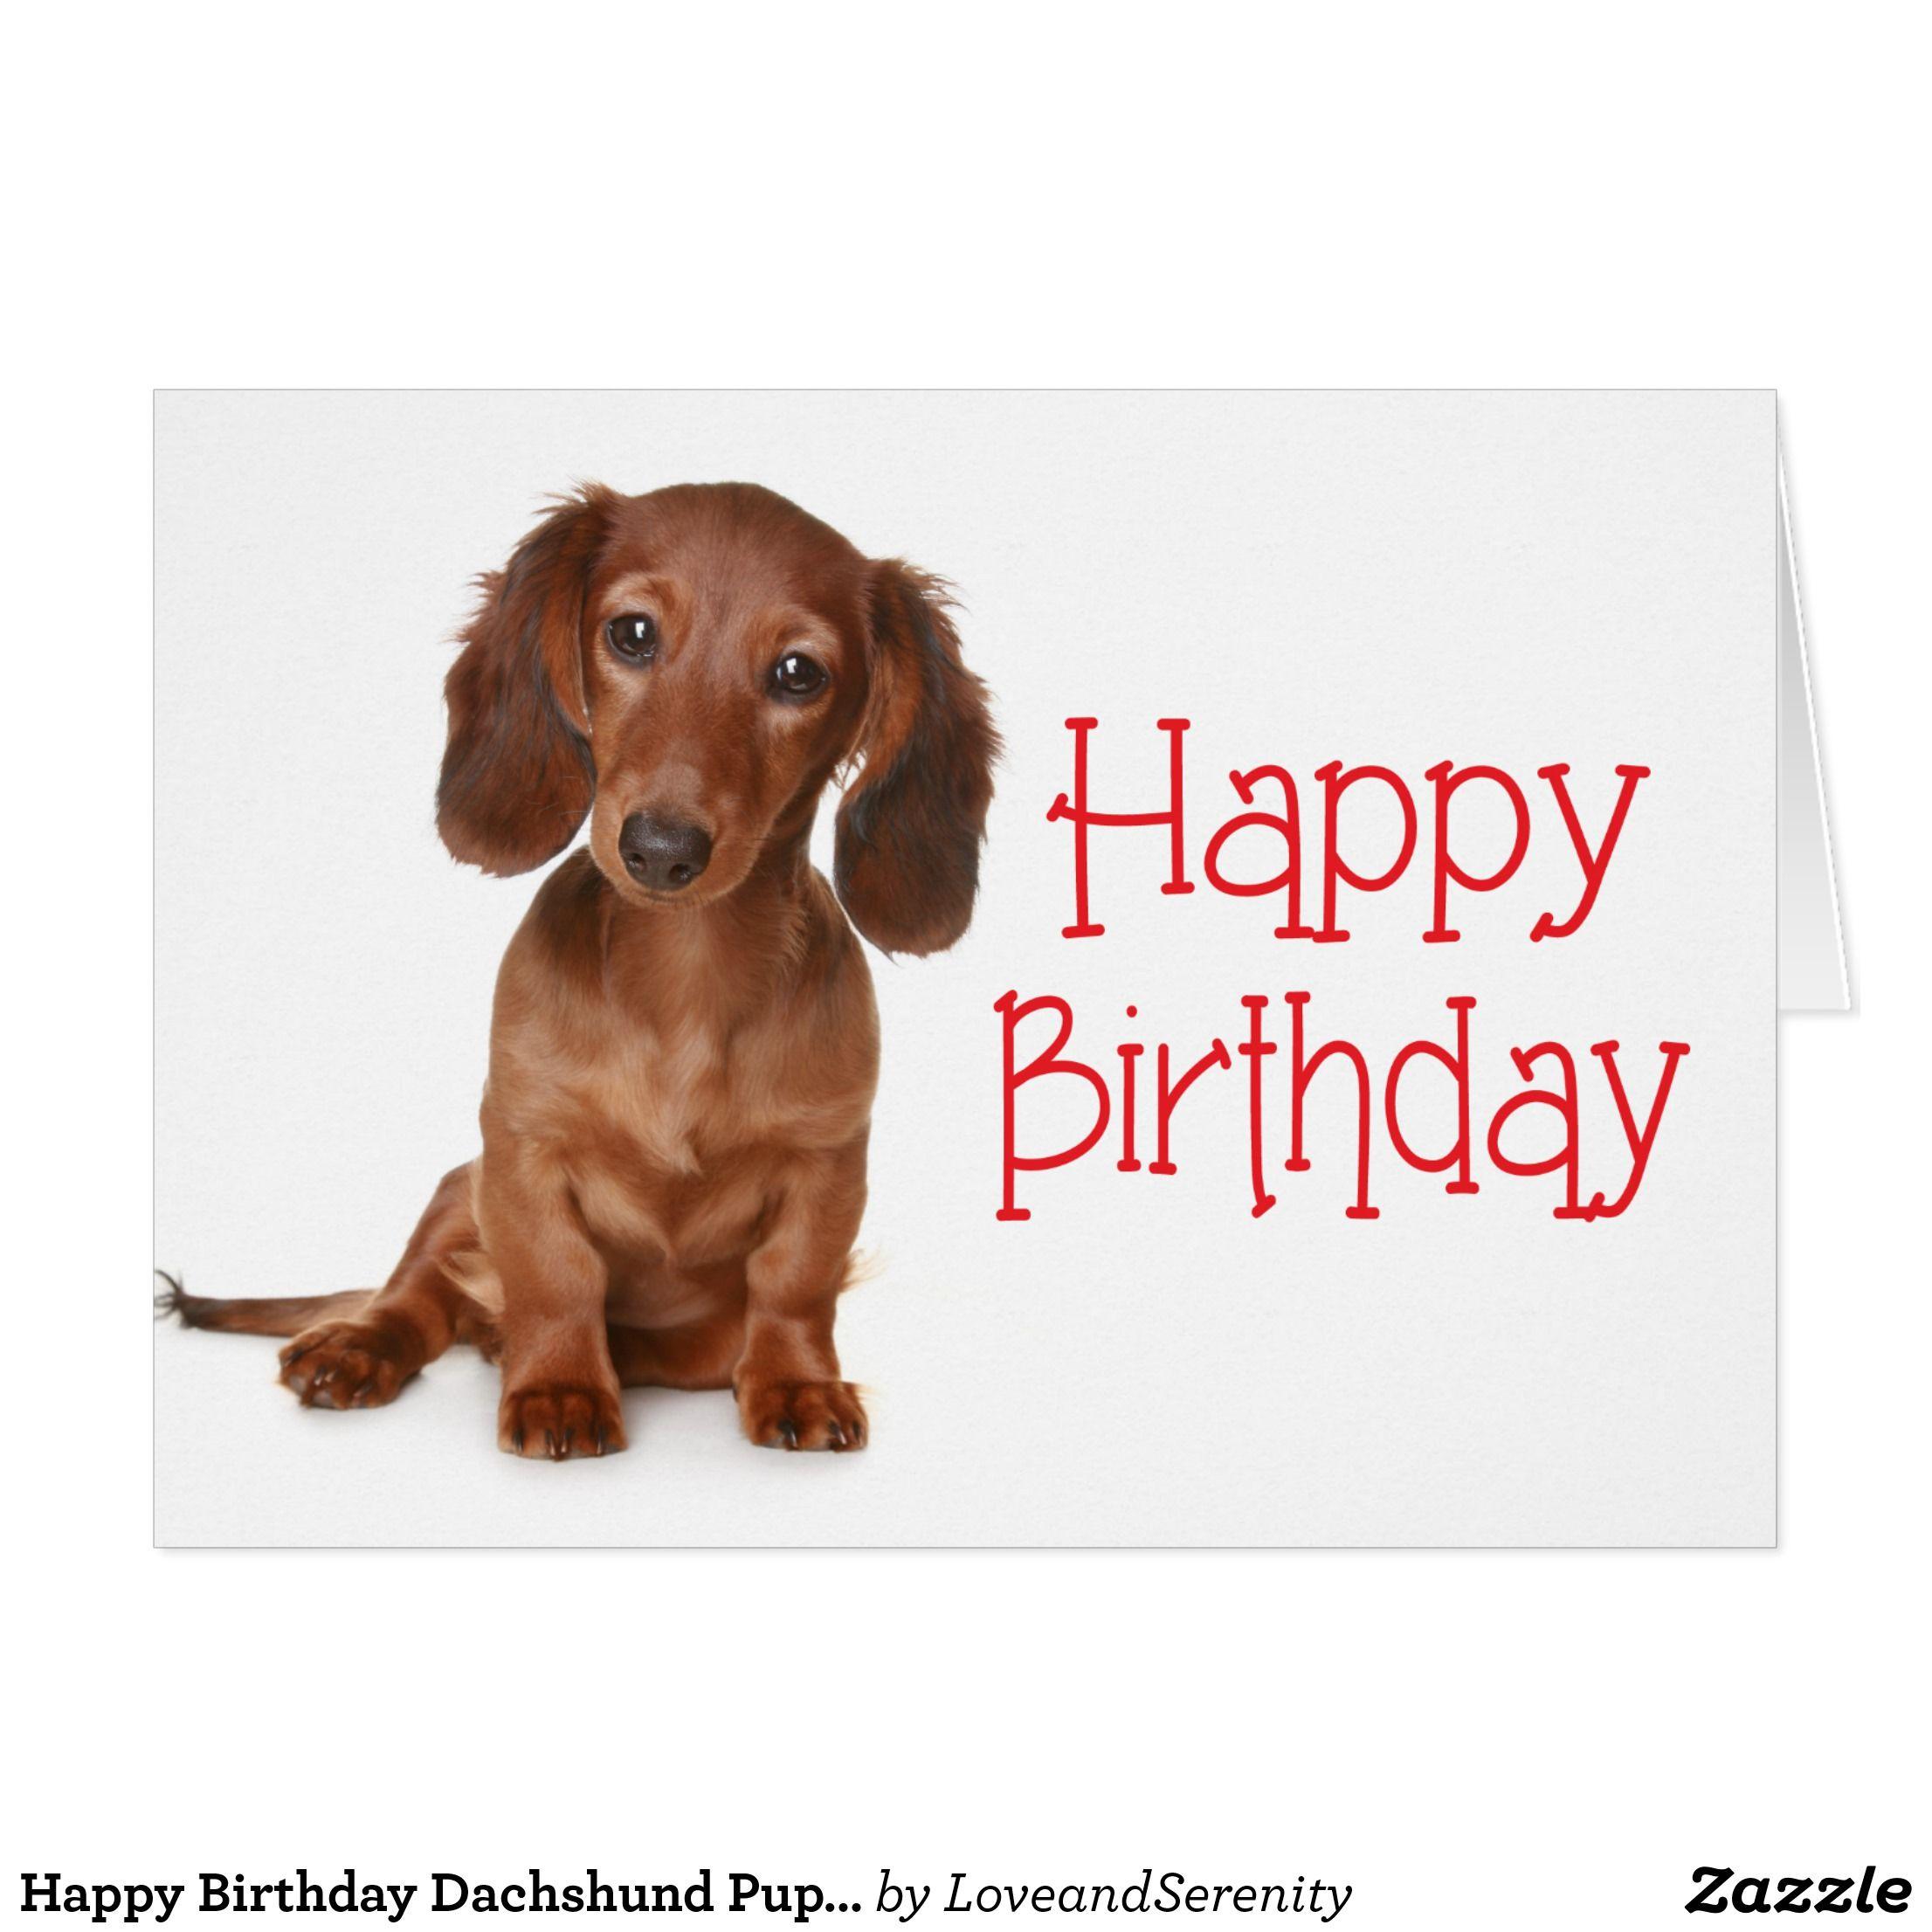 Happy Birthday Dachshund Puppy Dog Card Zazzle Com Happy